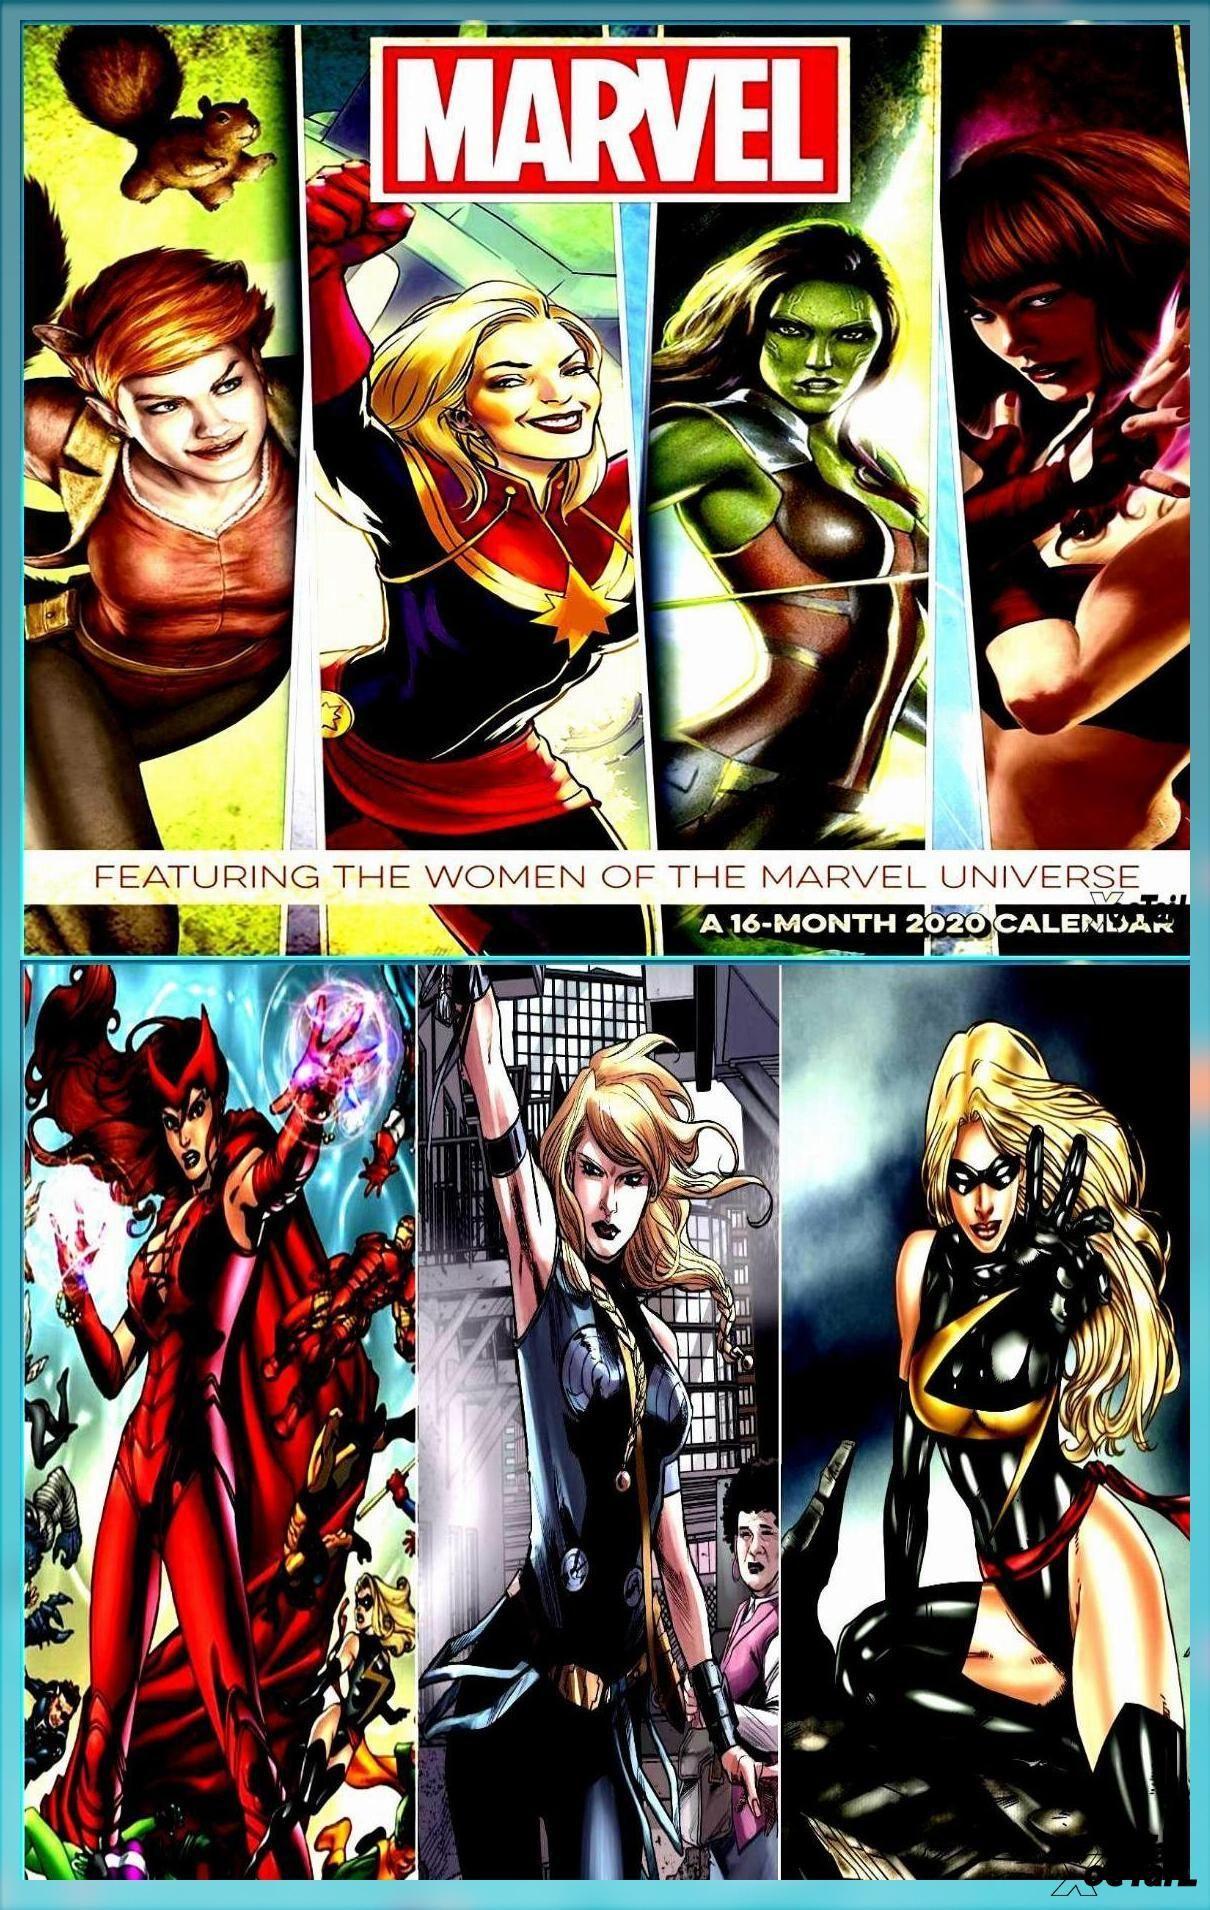 Women Of Marvel Comics Universe Comic Art 16 Month 2020 Wall Calendar New Sealed Avengers Marvel Female Marvel Comics Women Marvel Comics Marvel Comics Art